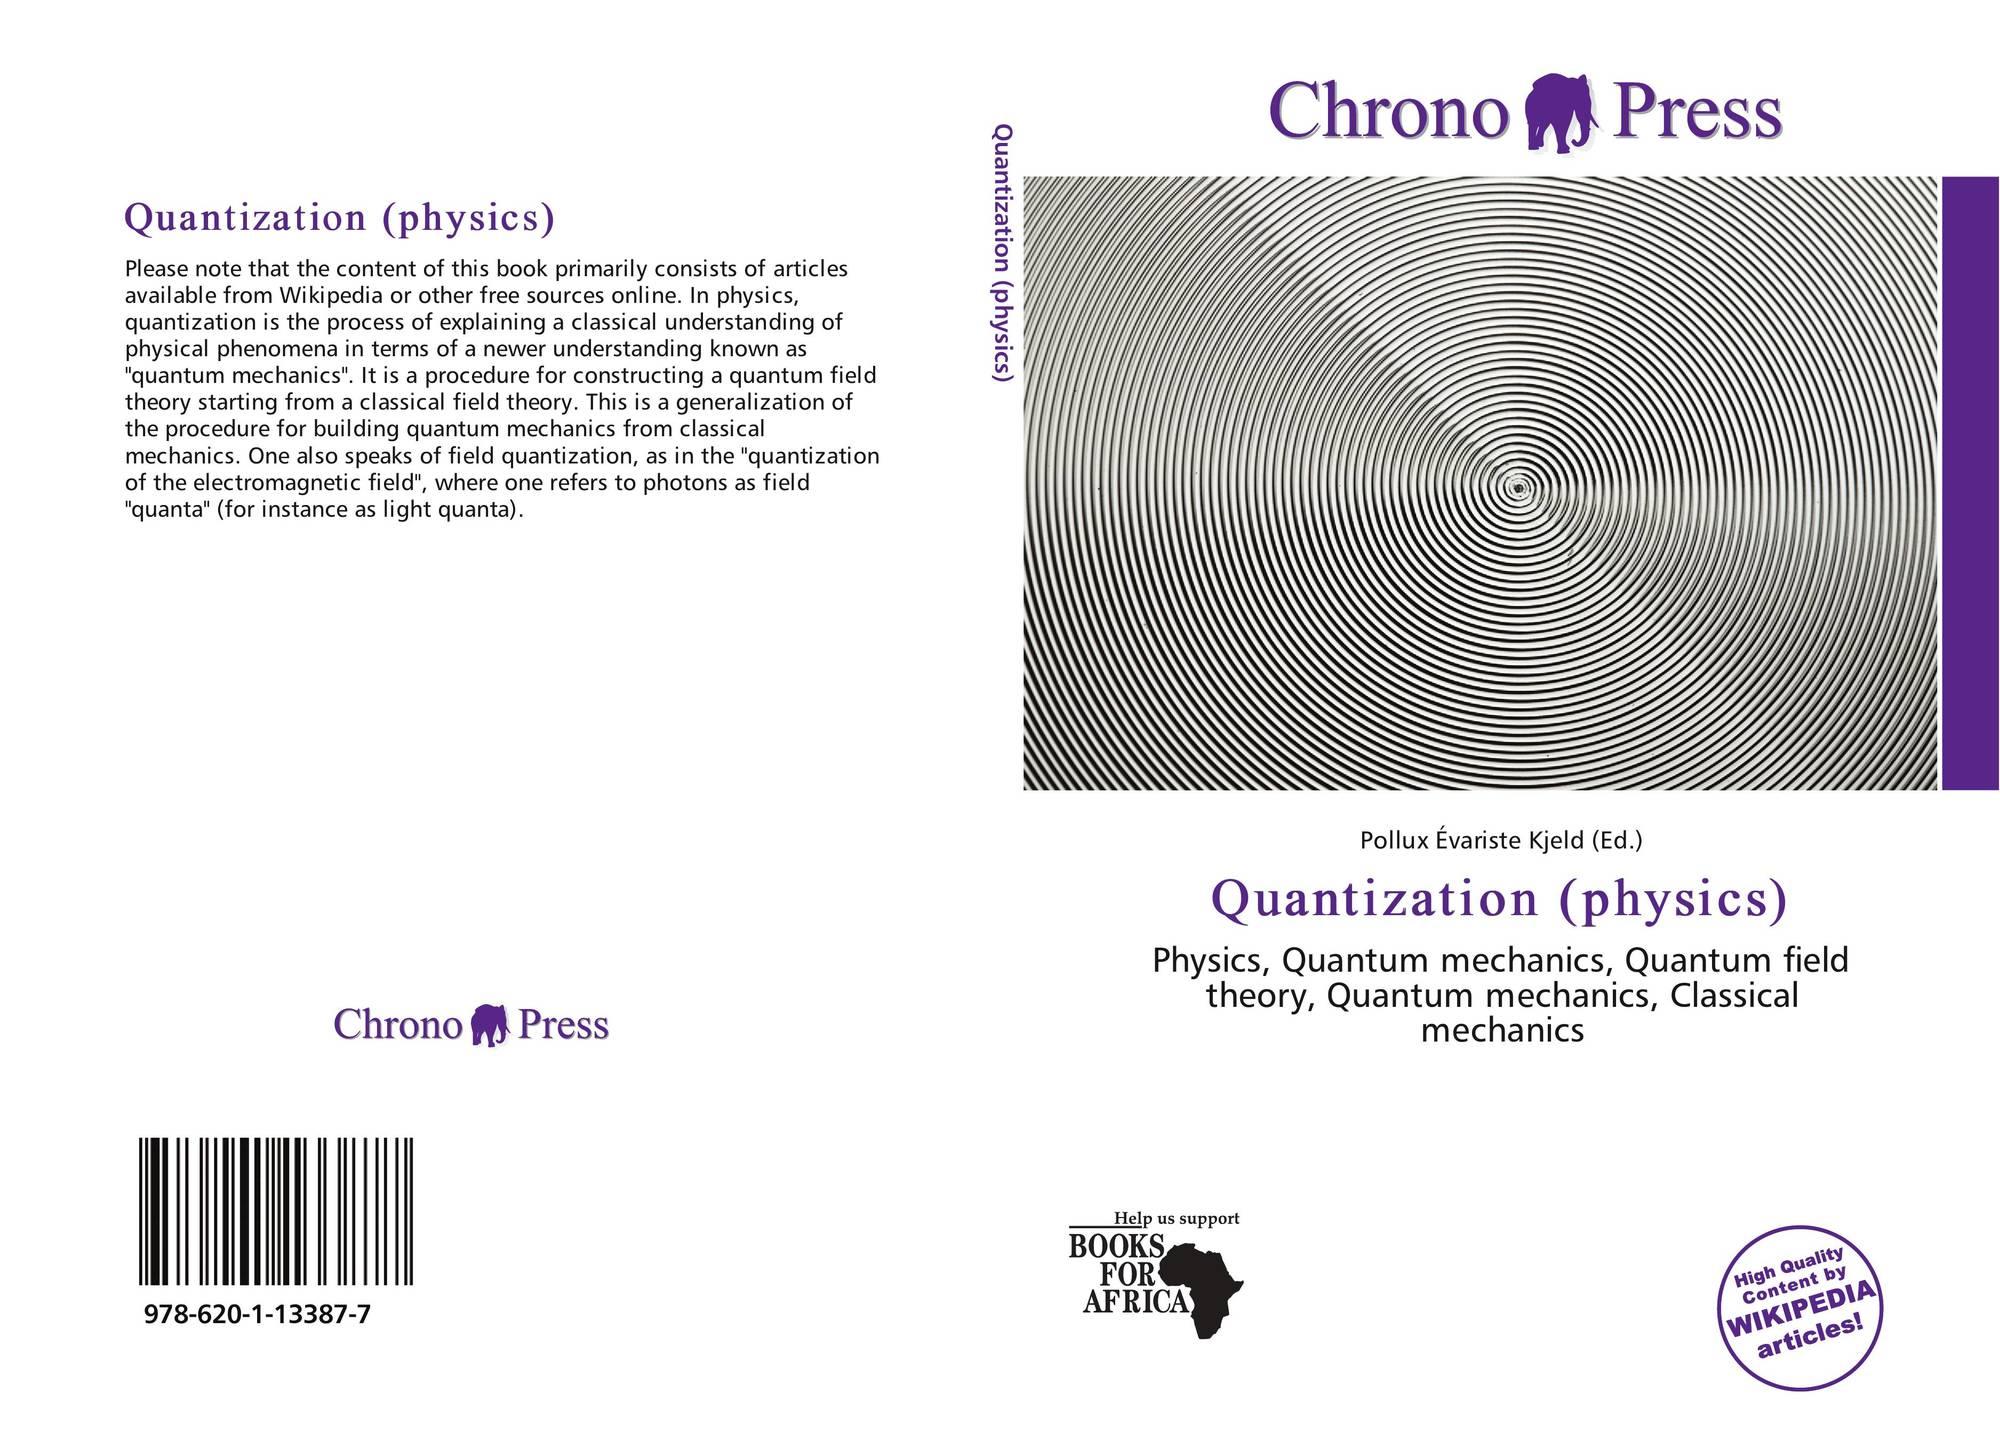 Quantization (physics), 978-620-1-13387-7, 6201133879 ,9786201133877